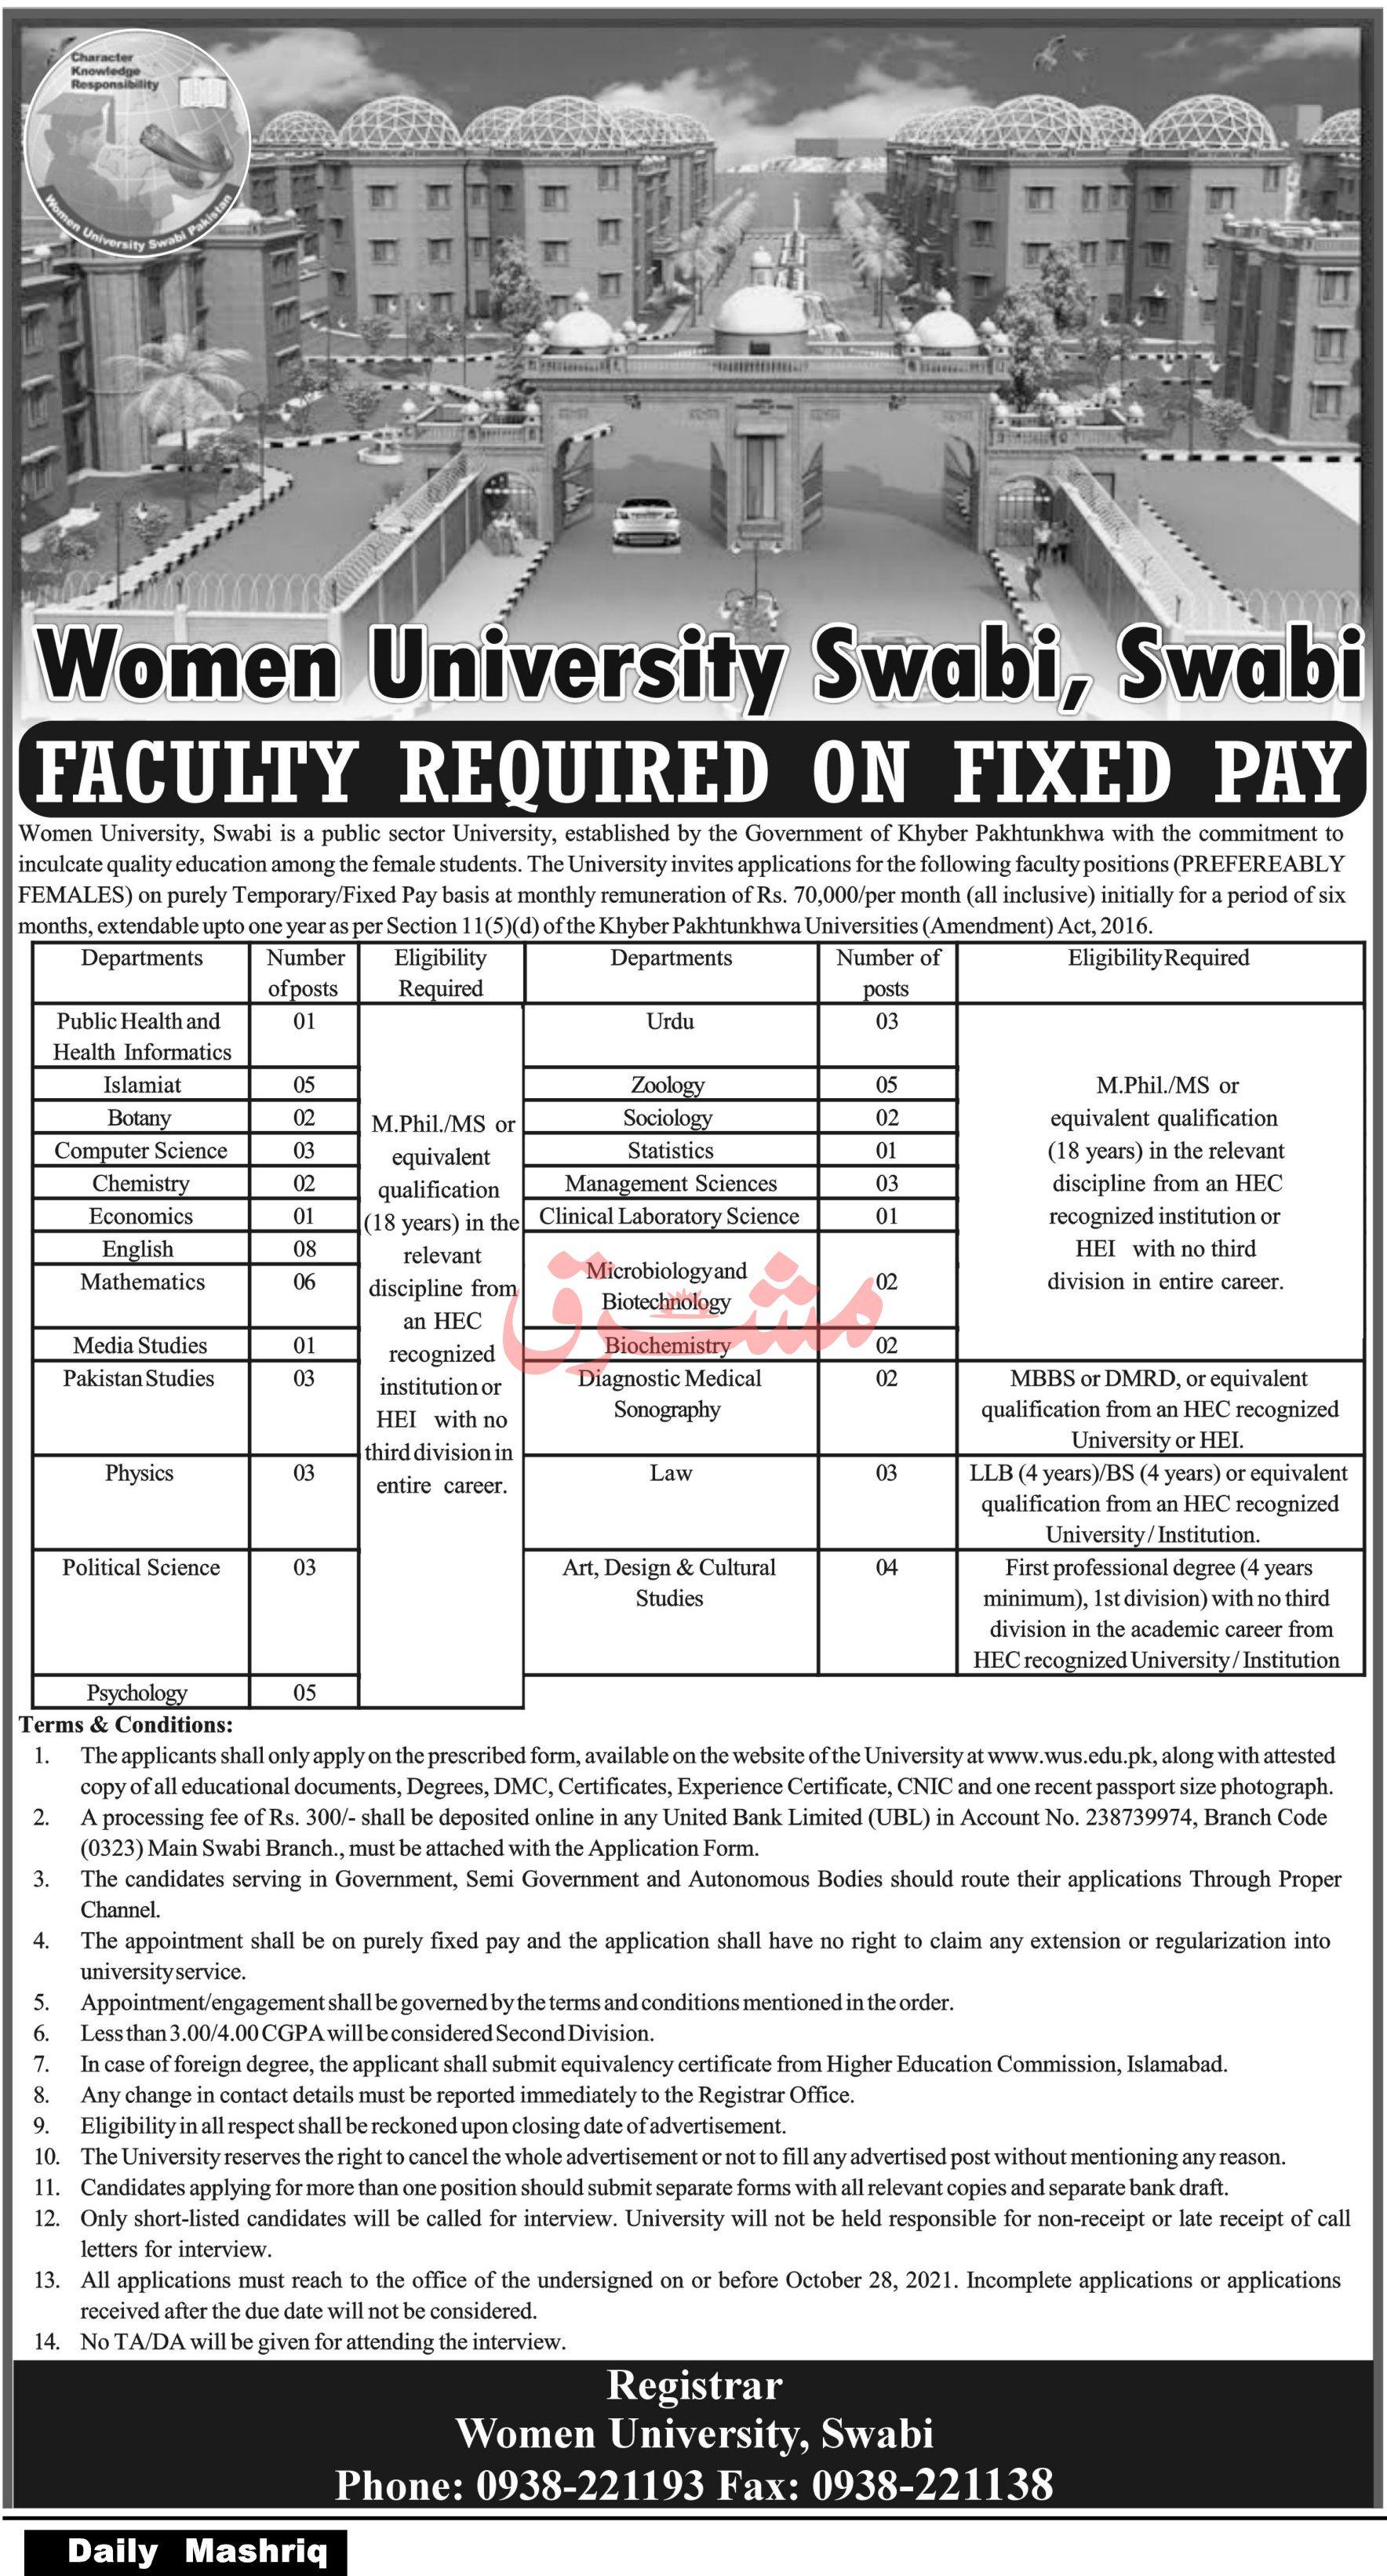 Women University Swabi Vacancies 2021 – Latest Jobs 3